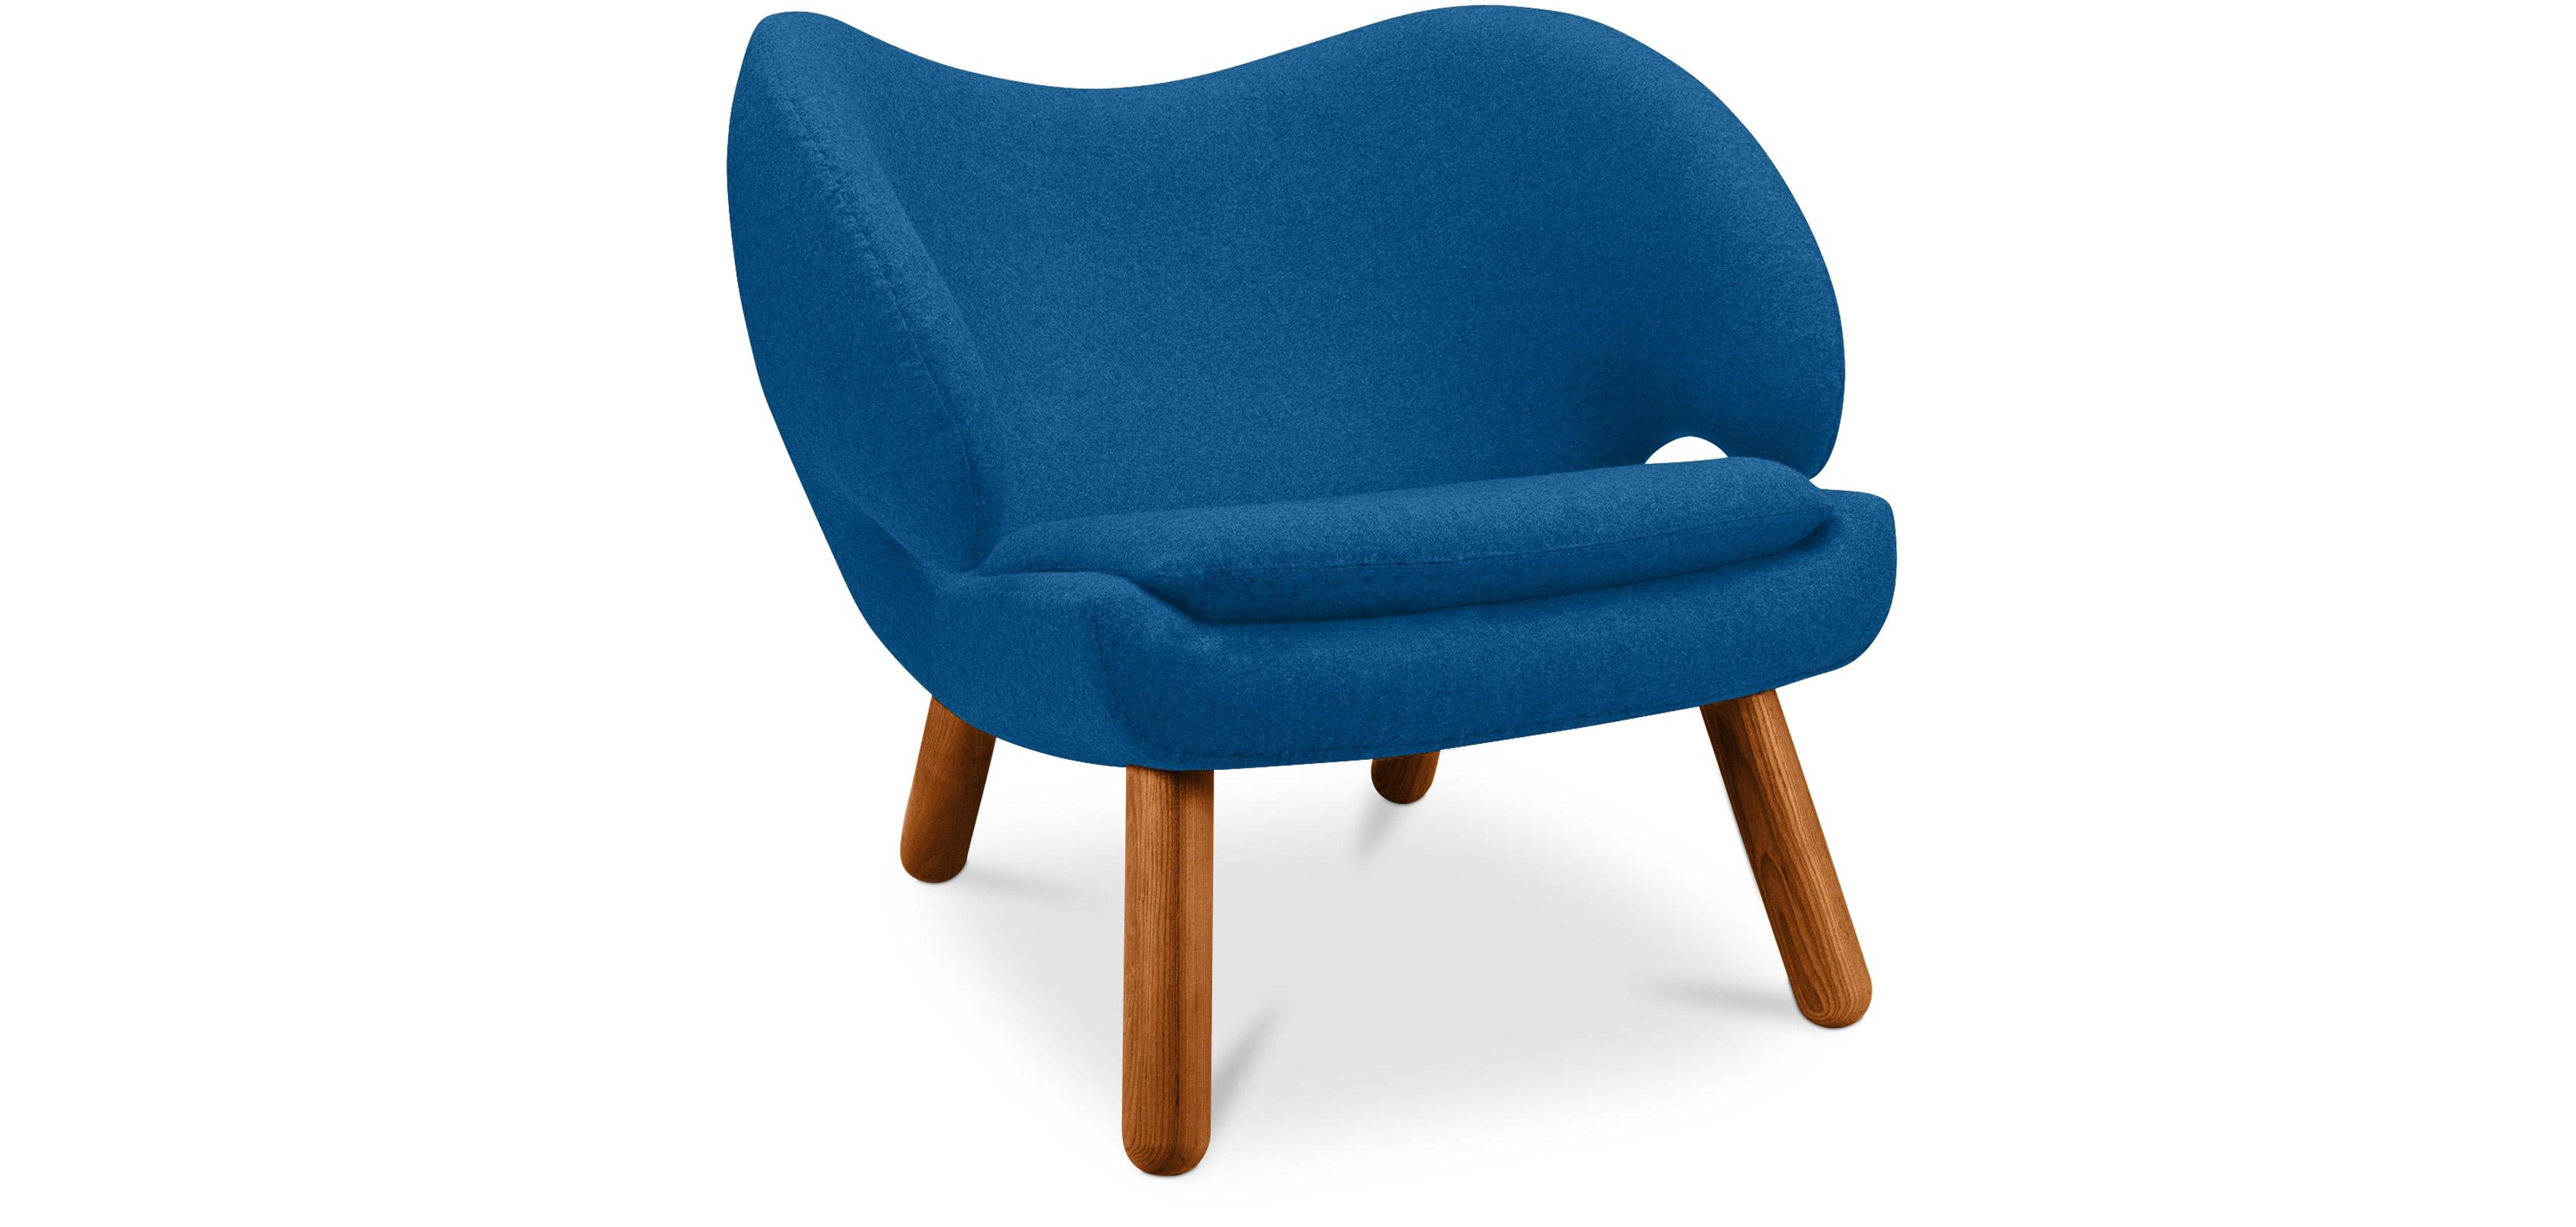 Pelikan skandinavisches design sessel finn juhl - Sessel skandinavisches design ...